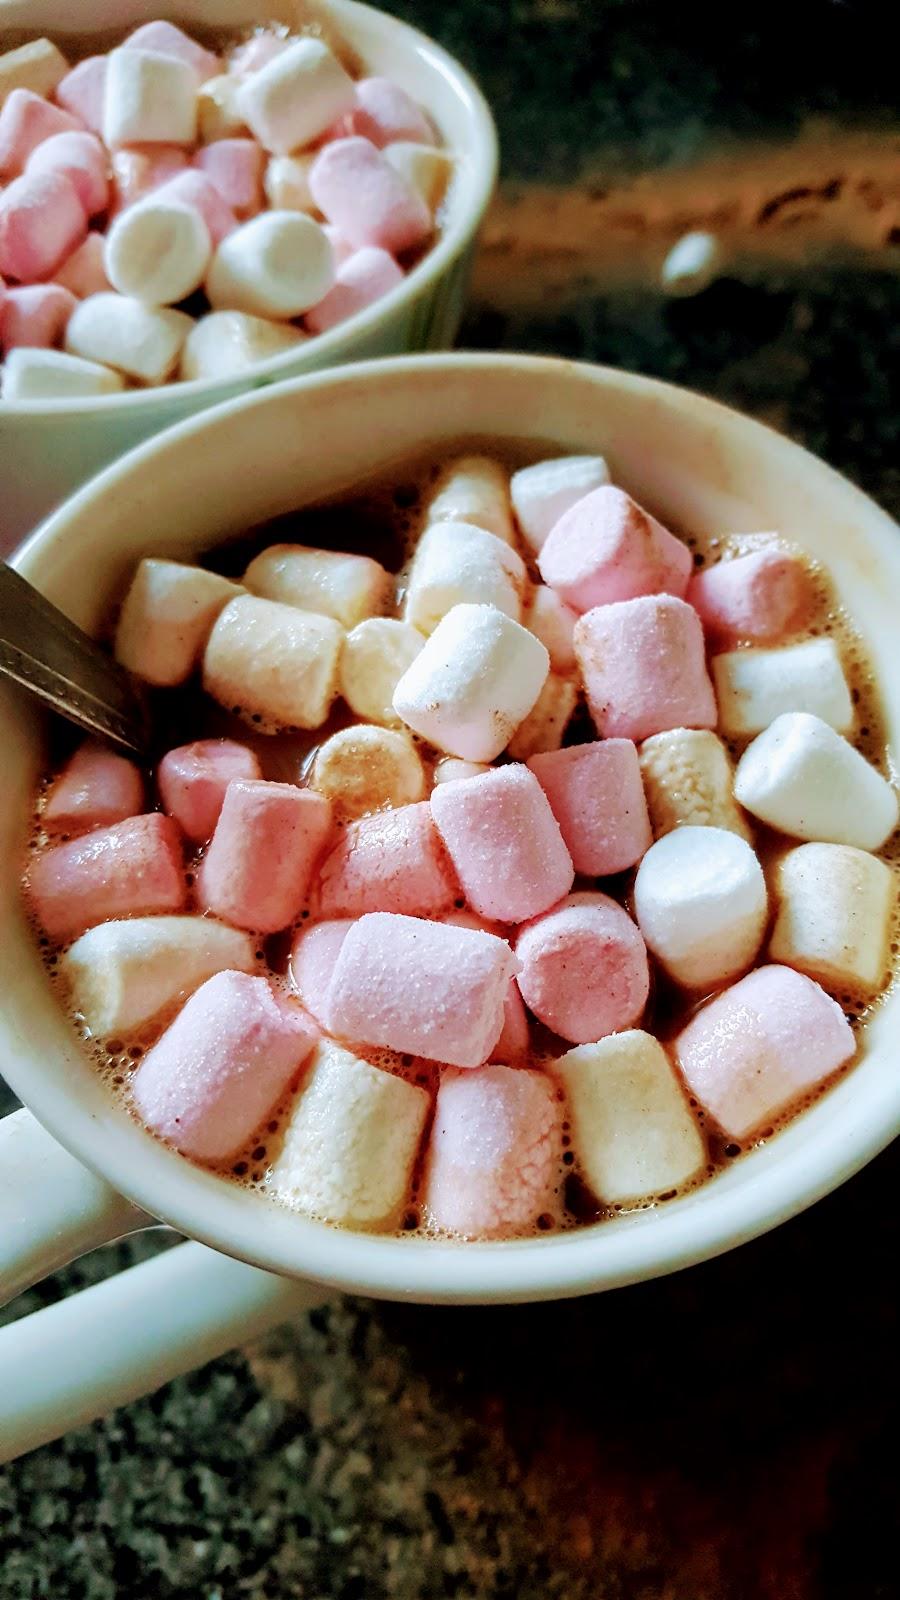 Hot Hot Hot Chocolate: The Wednesday Blog Hop